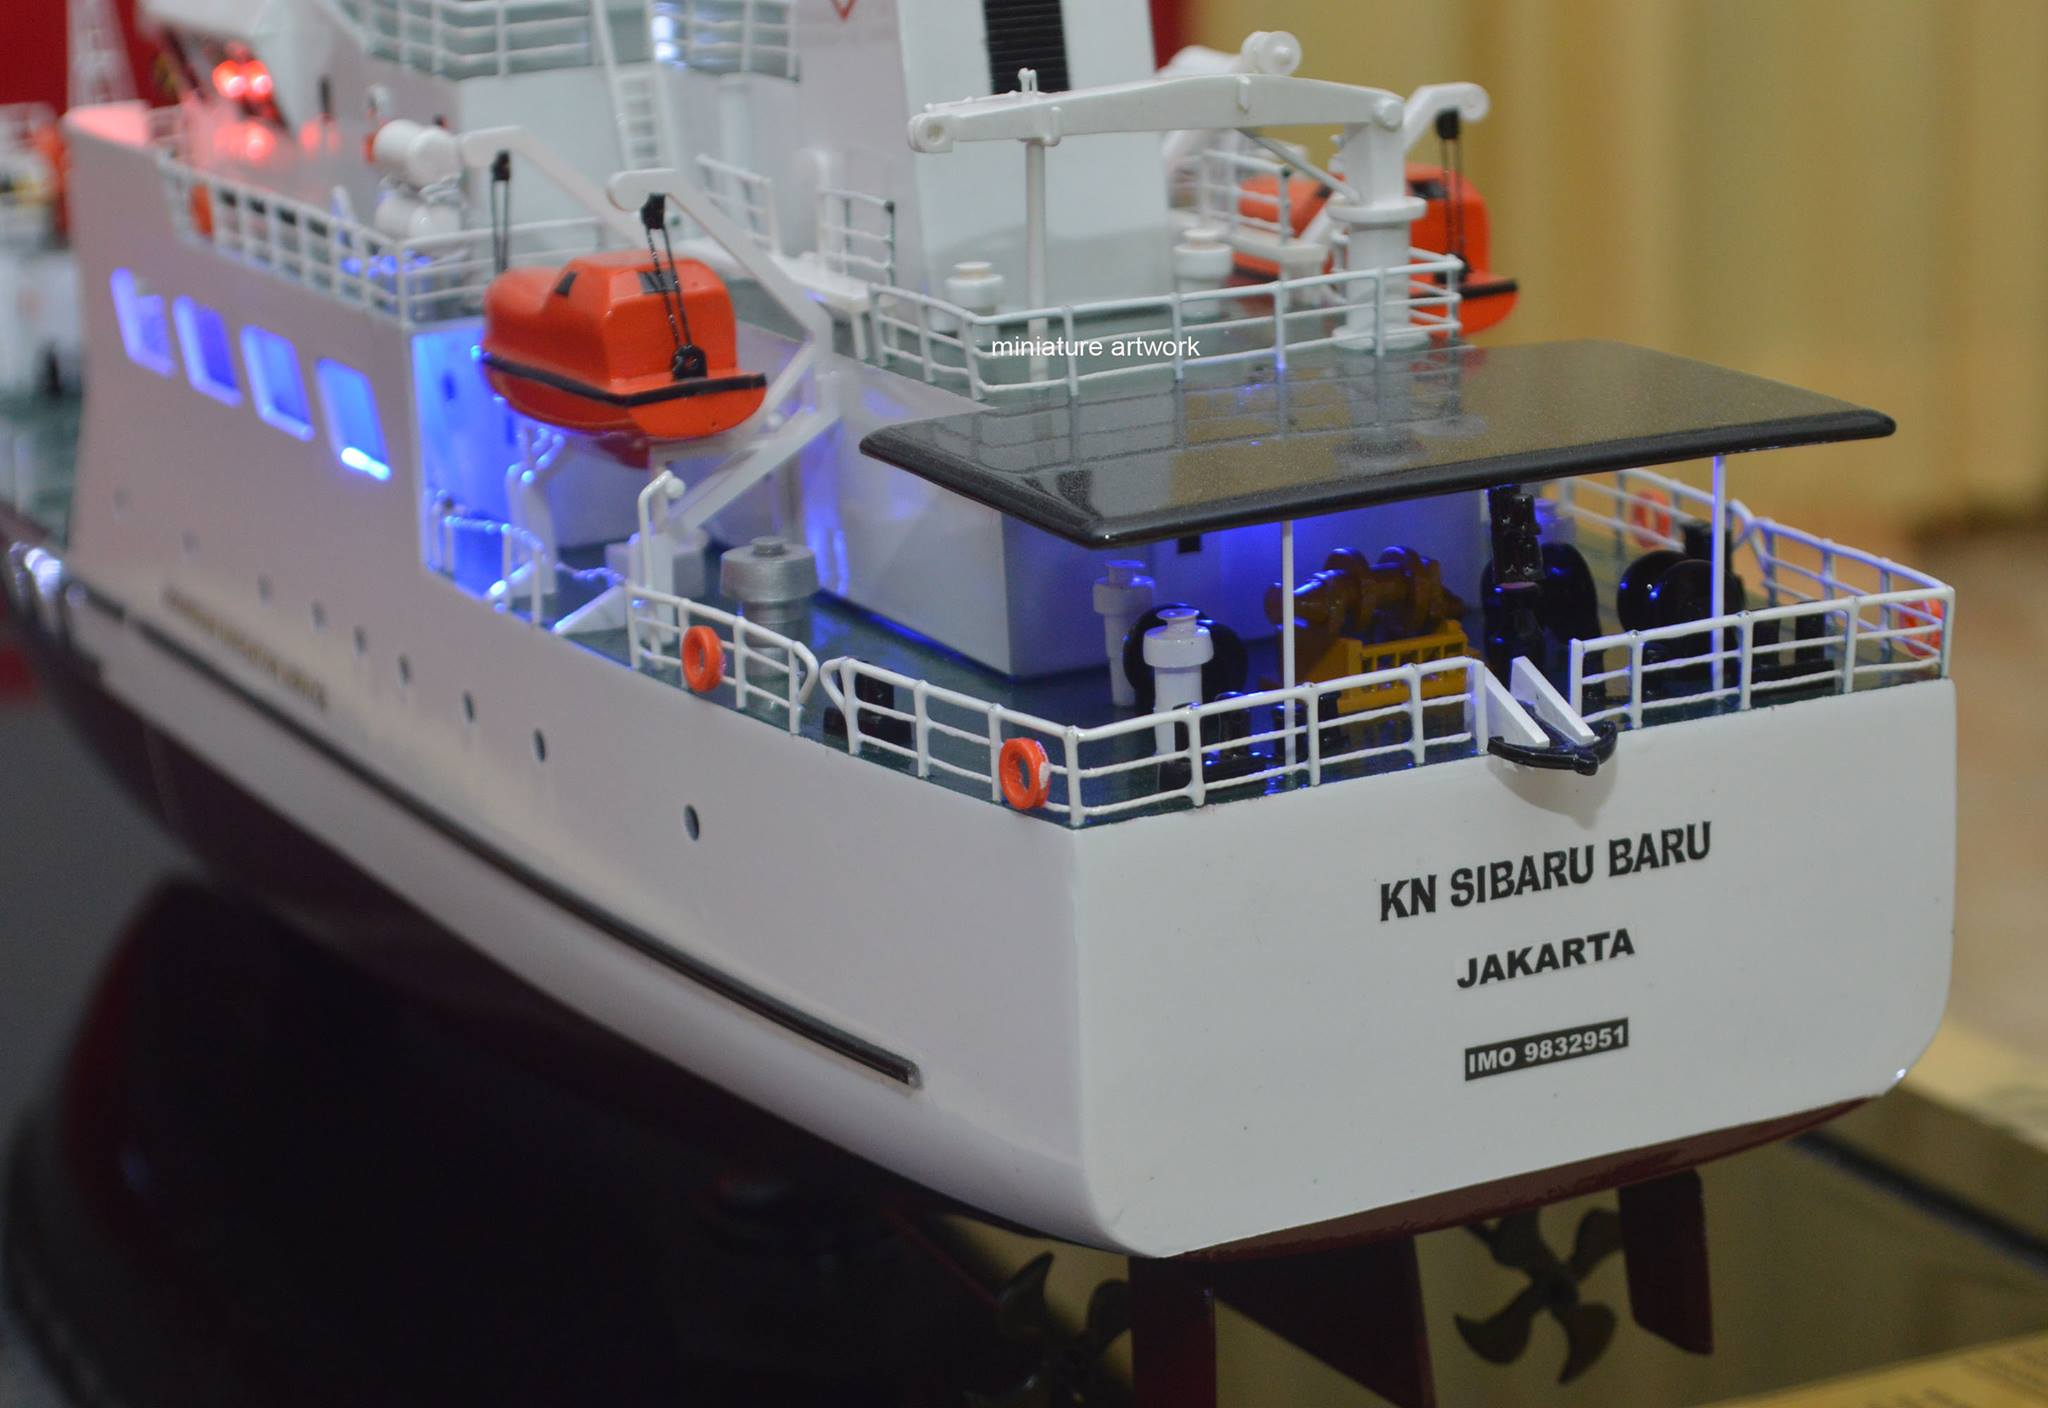 tempat jual miniatur kapal kn sibaru baru planet kapal rumpun artwork harga murah